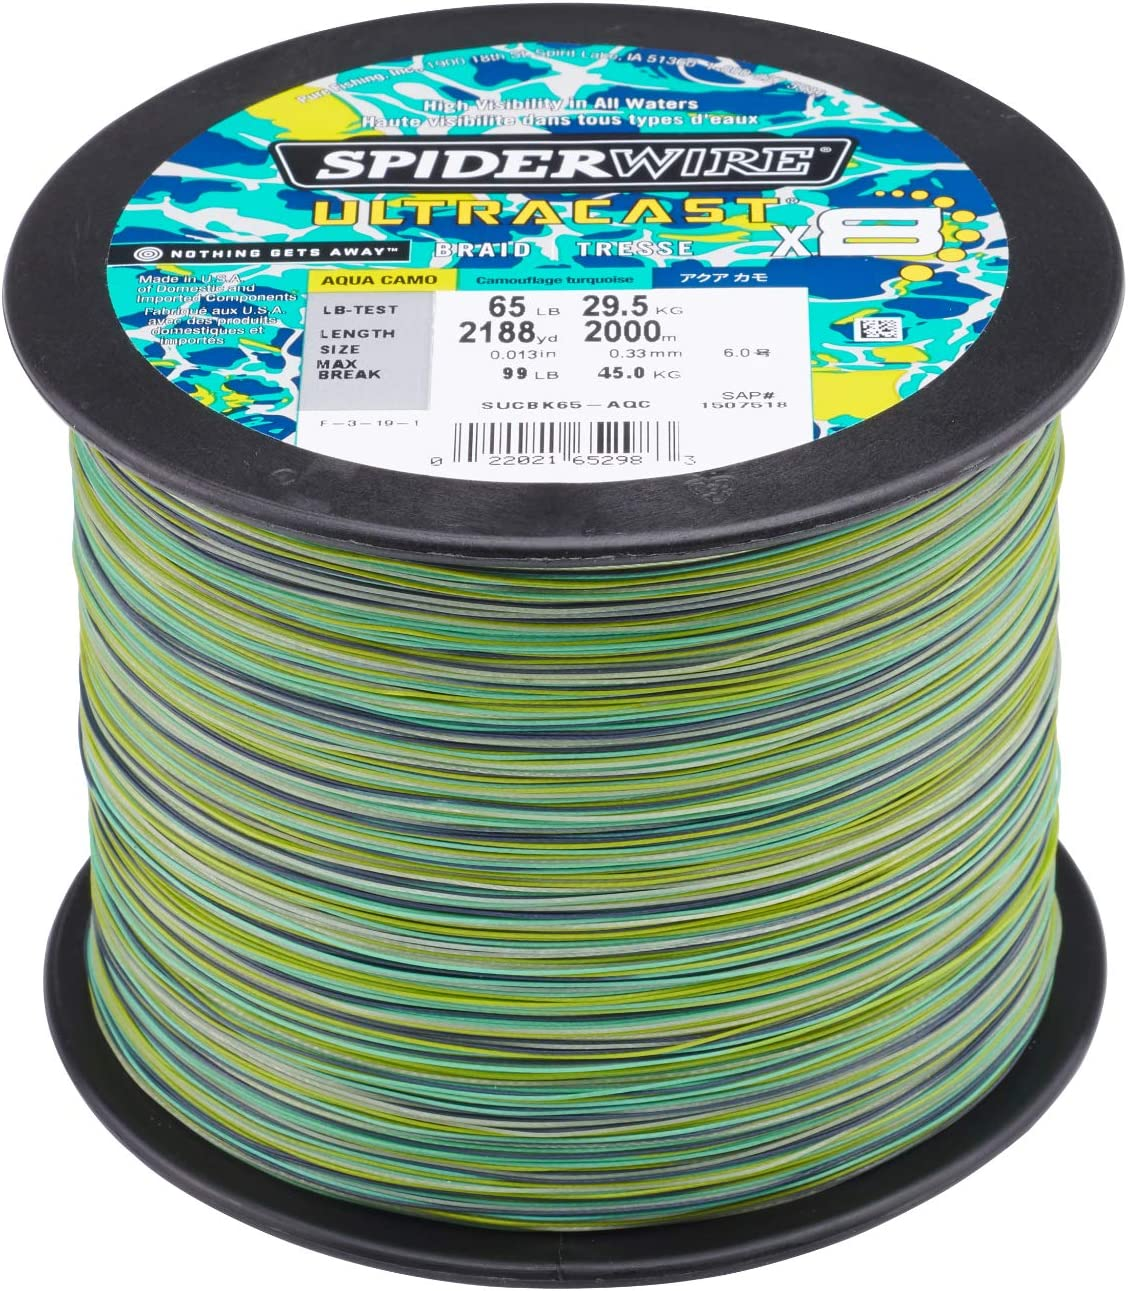 SpiderWire Ultracast Braid Fishing Line ついに入荷 高品質新品